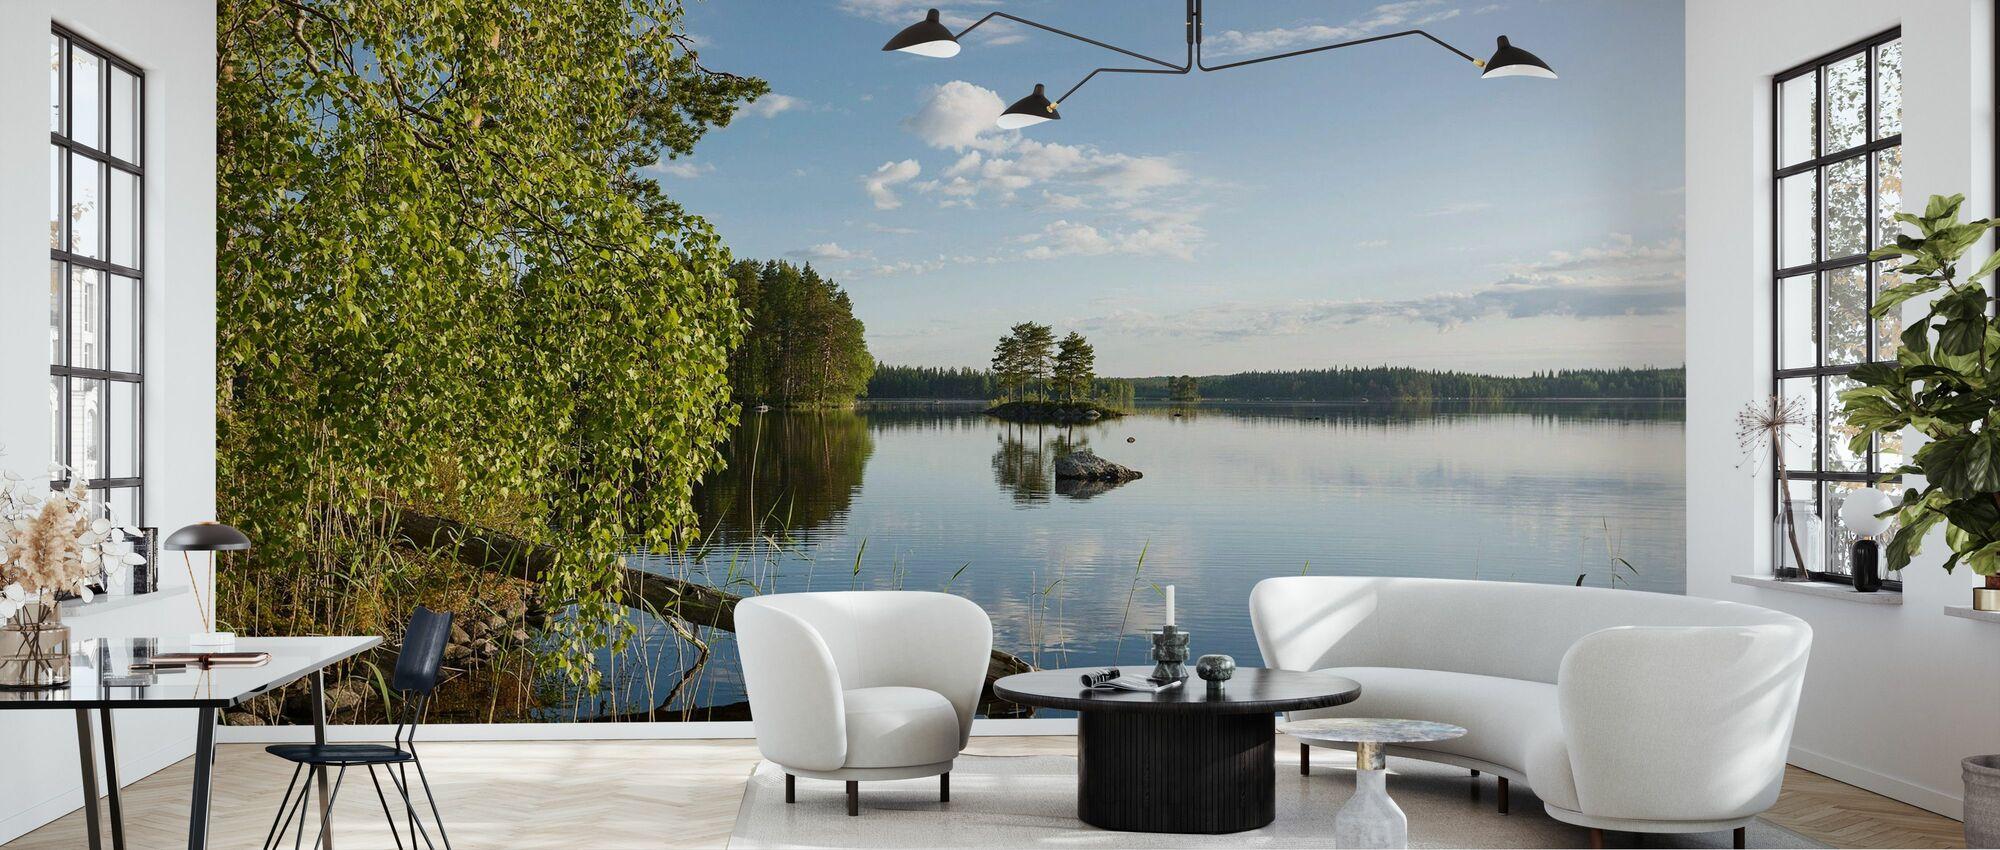 Swedish Lake Landscape - Wallpaper - Living Room